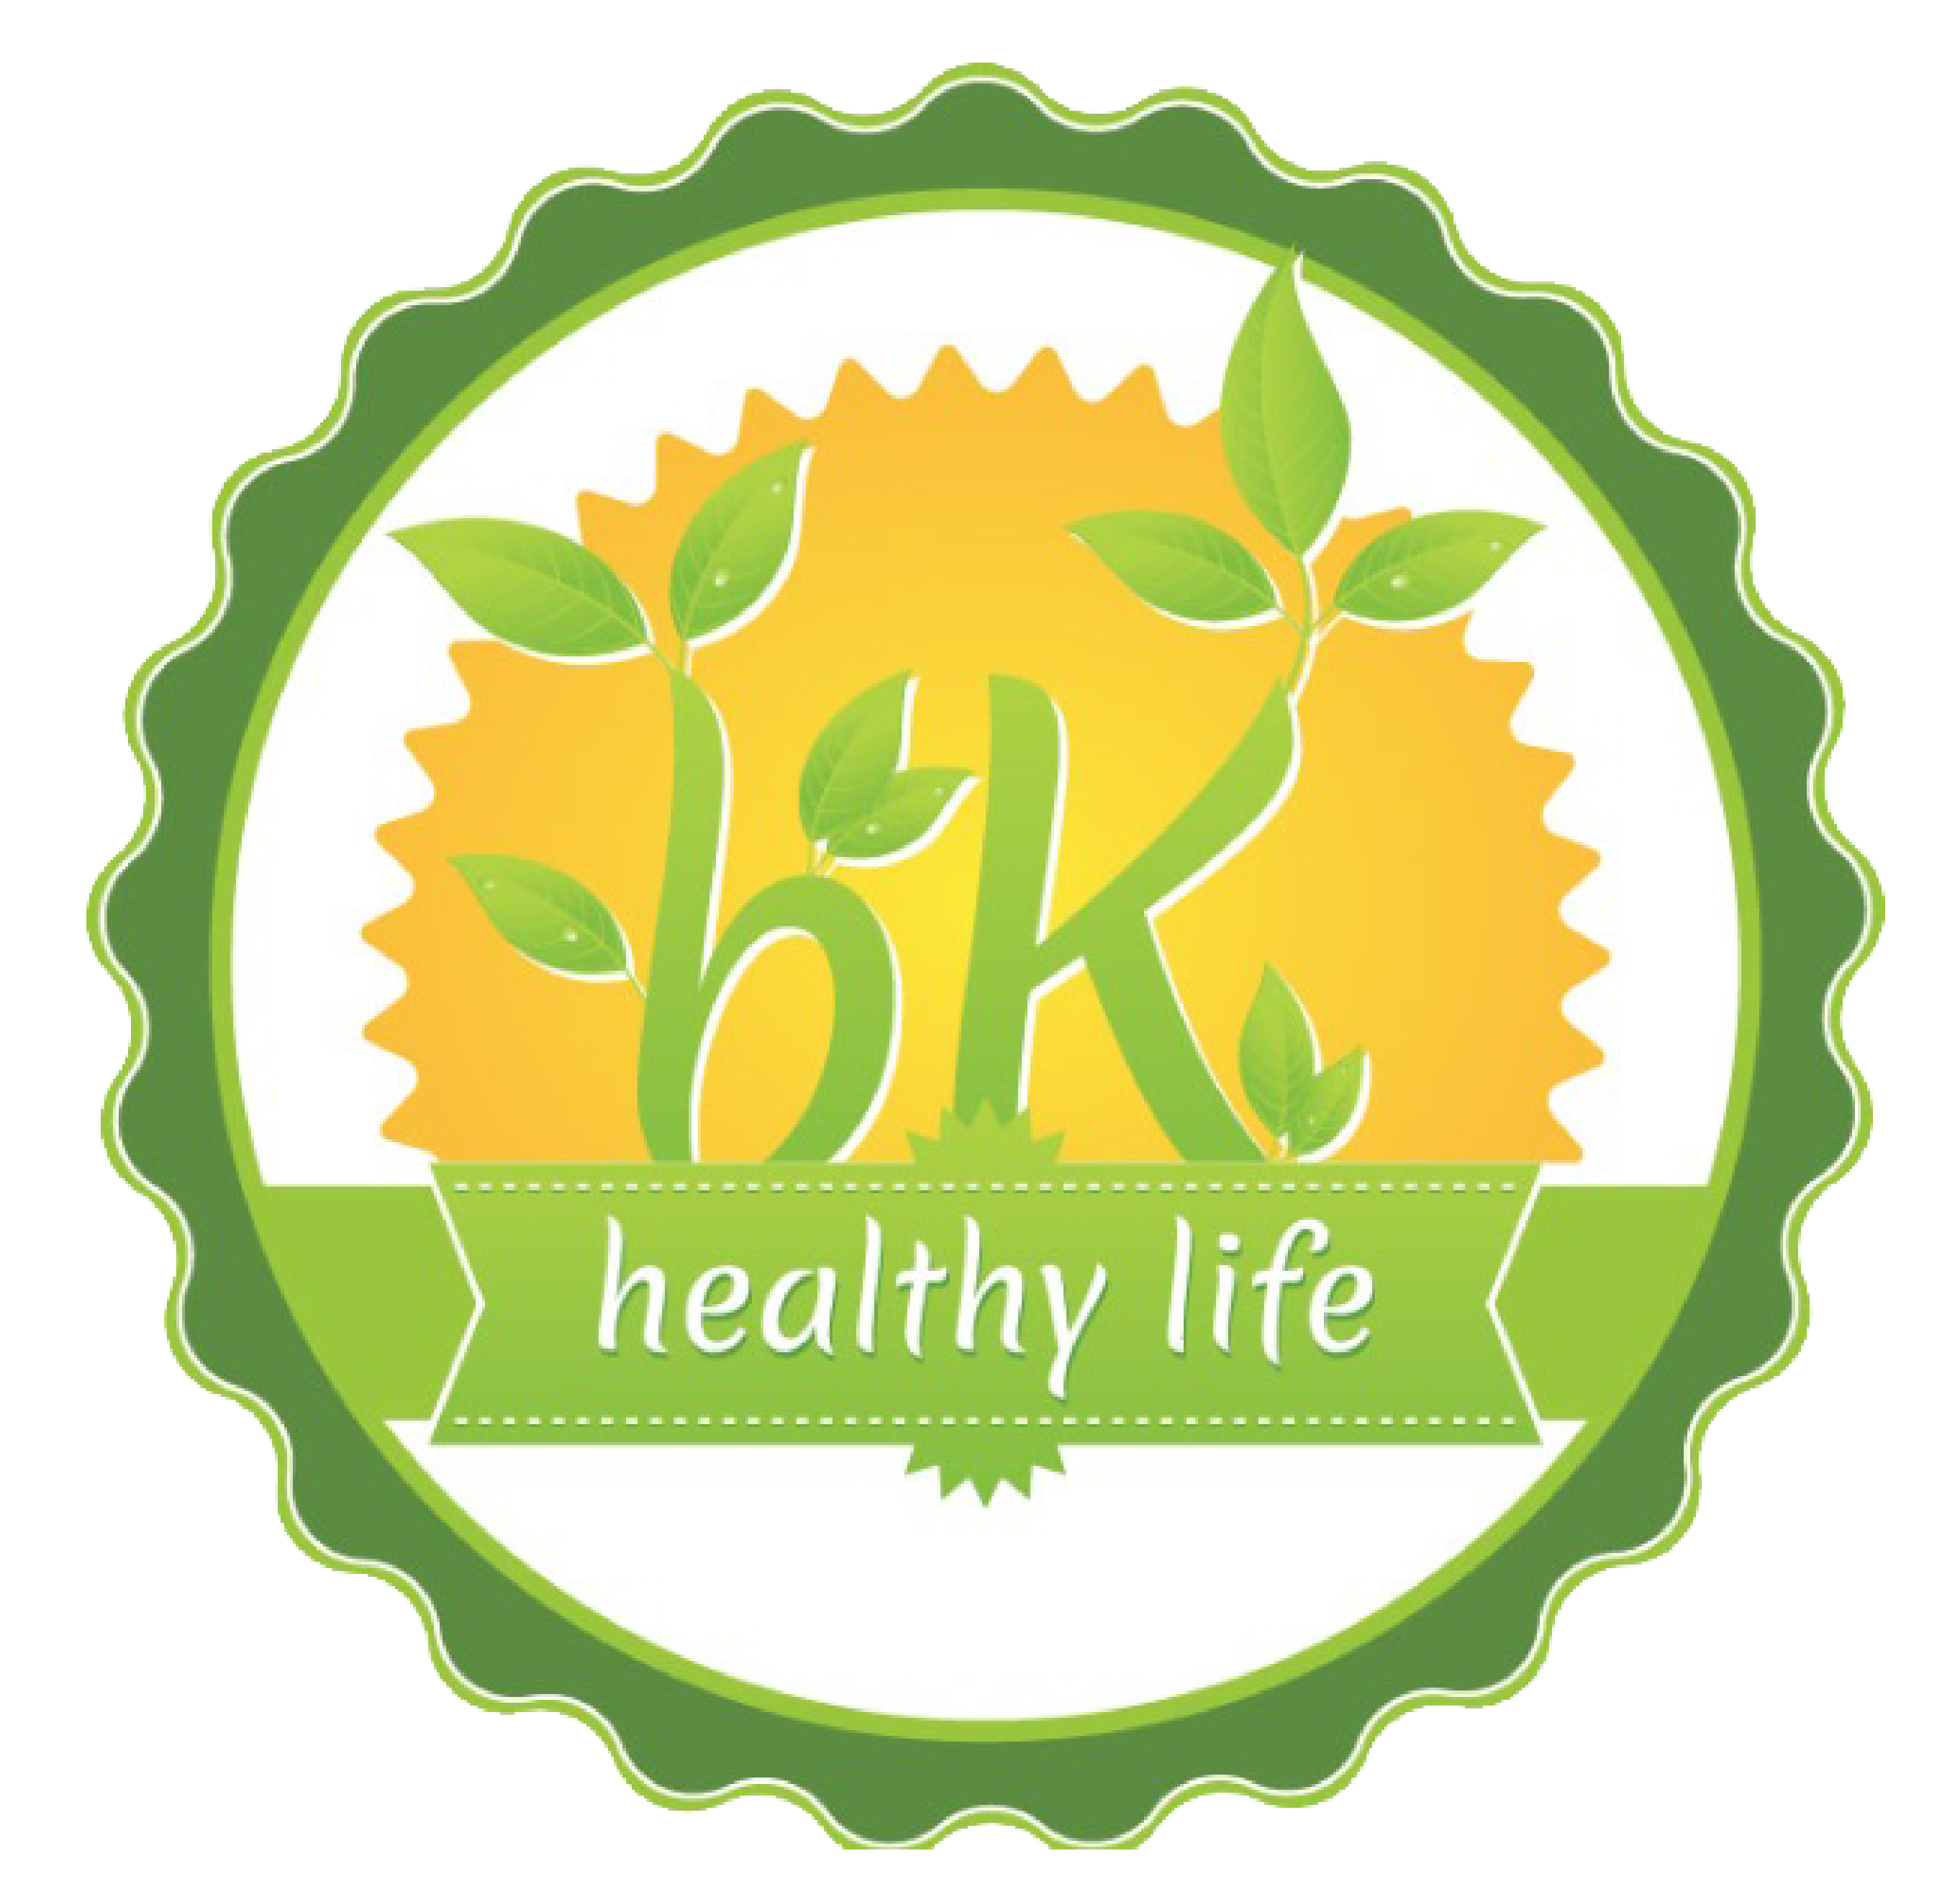 BK Healthy Life